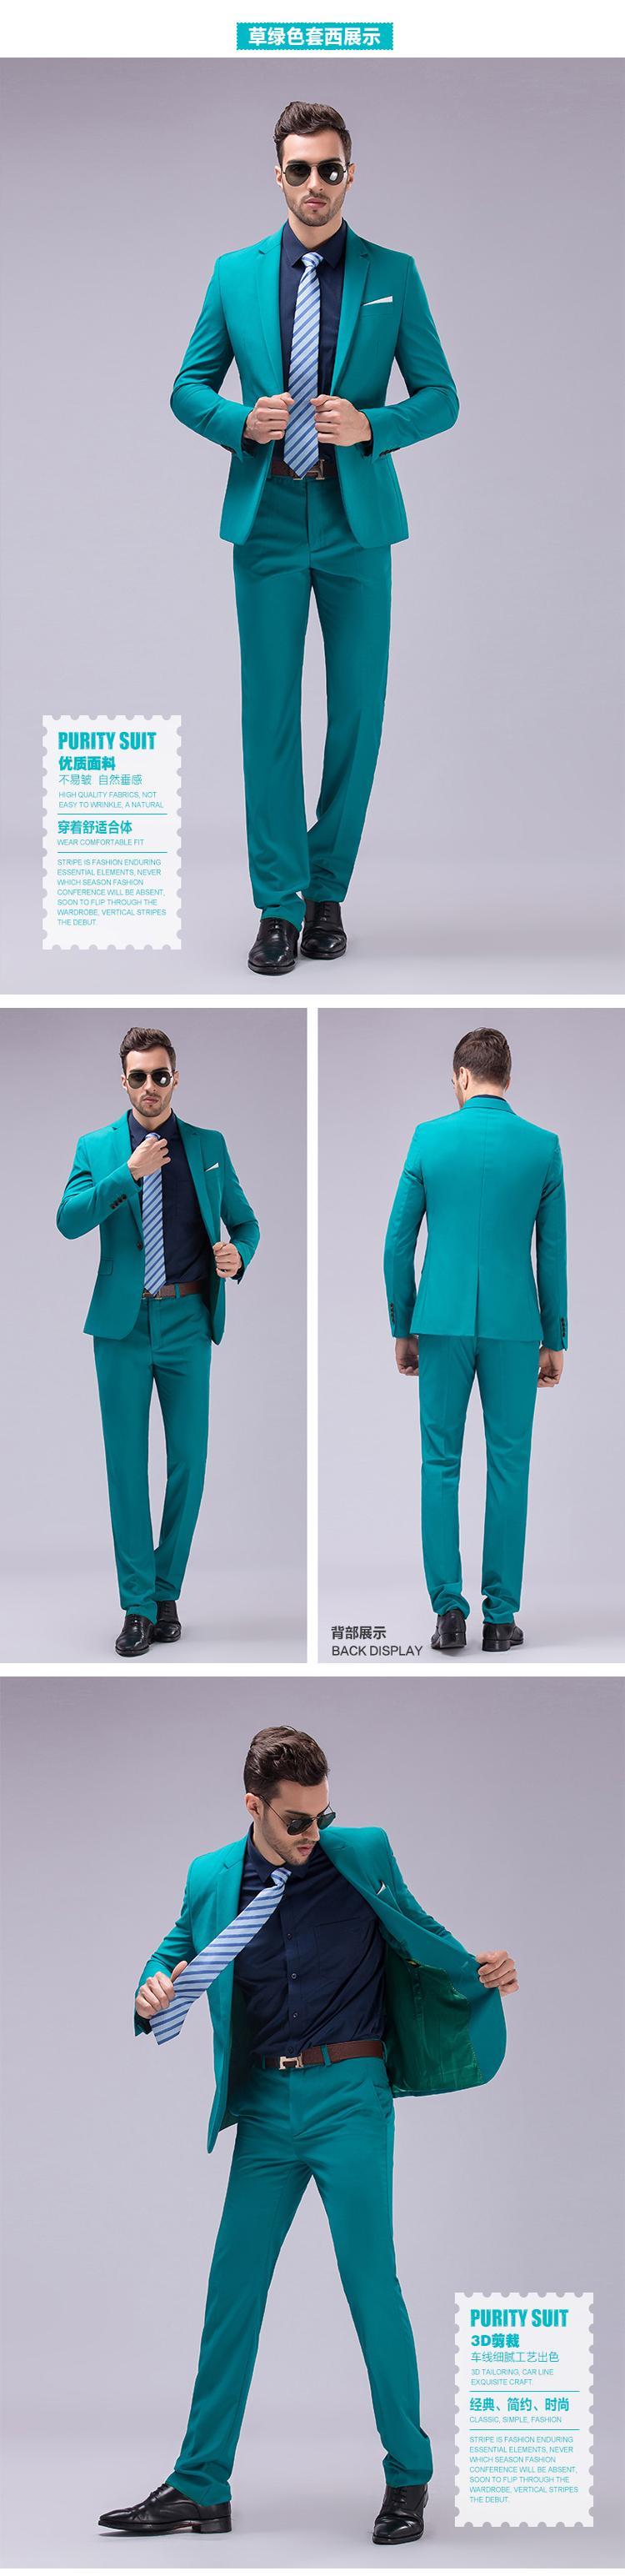 3bd738adca6 2017 High Quality New Spring Autumn Cotton Linen blend Blazer Men Casual  Outwear Slim Business suit Black gray plus size M-3XLUSD 78.00 piece